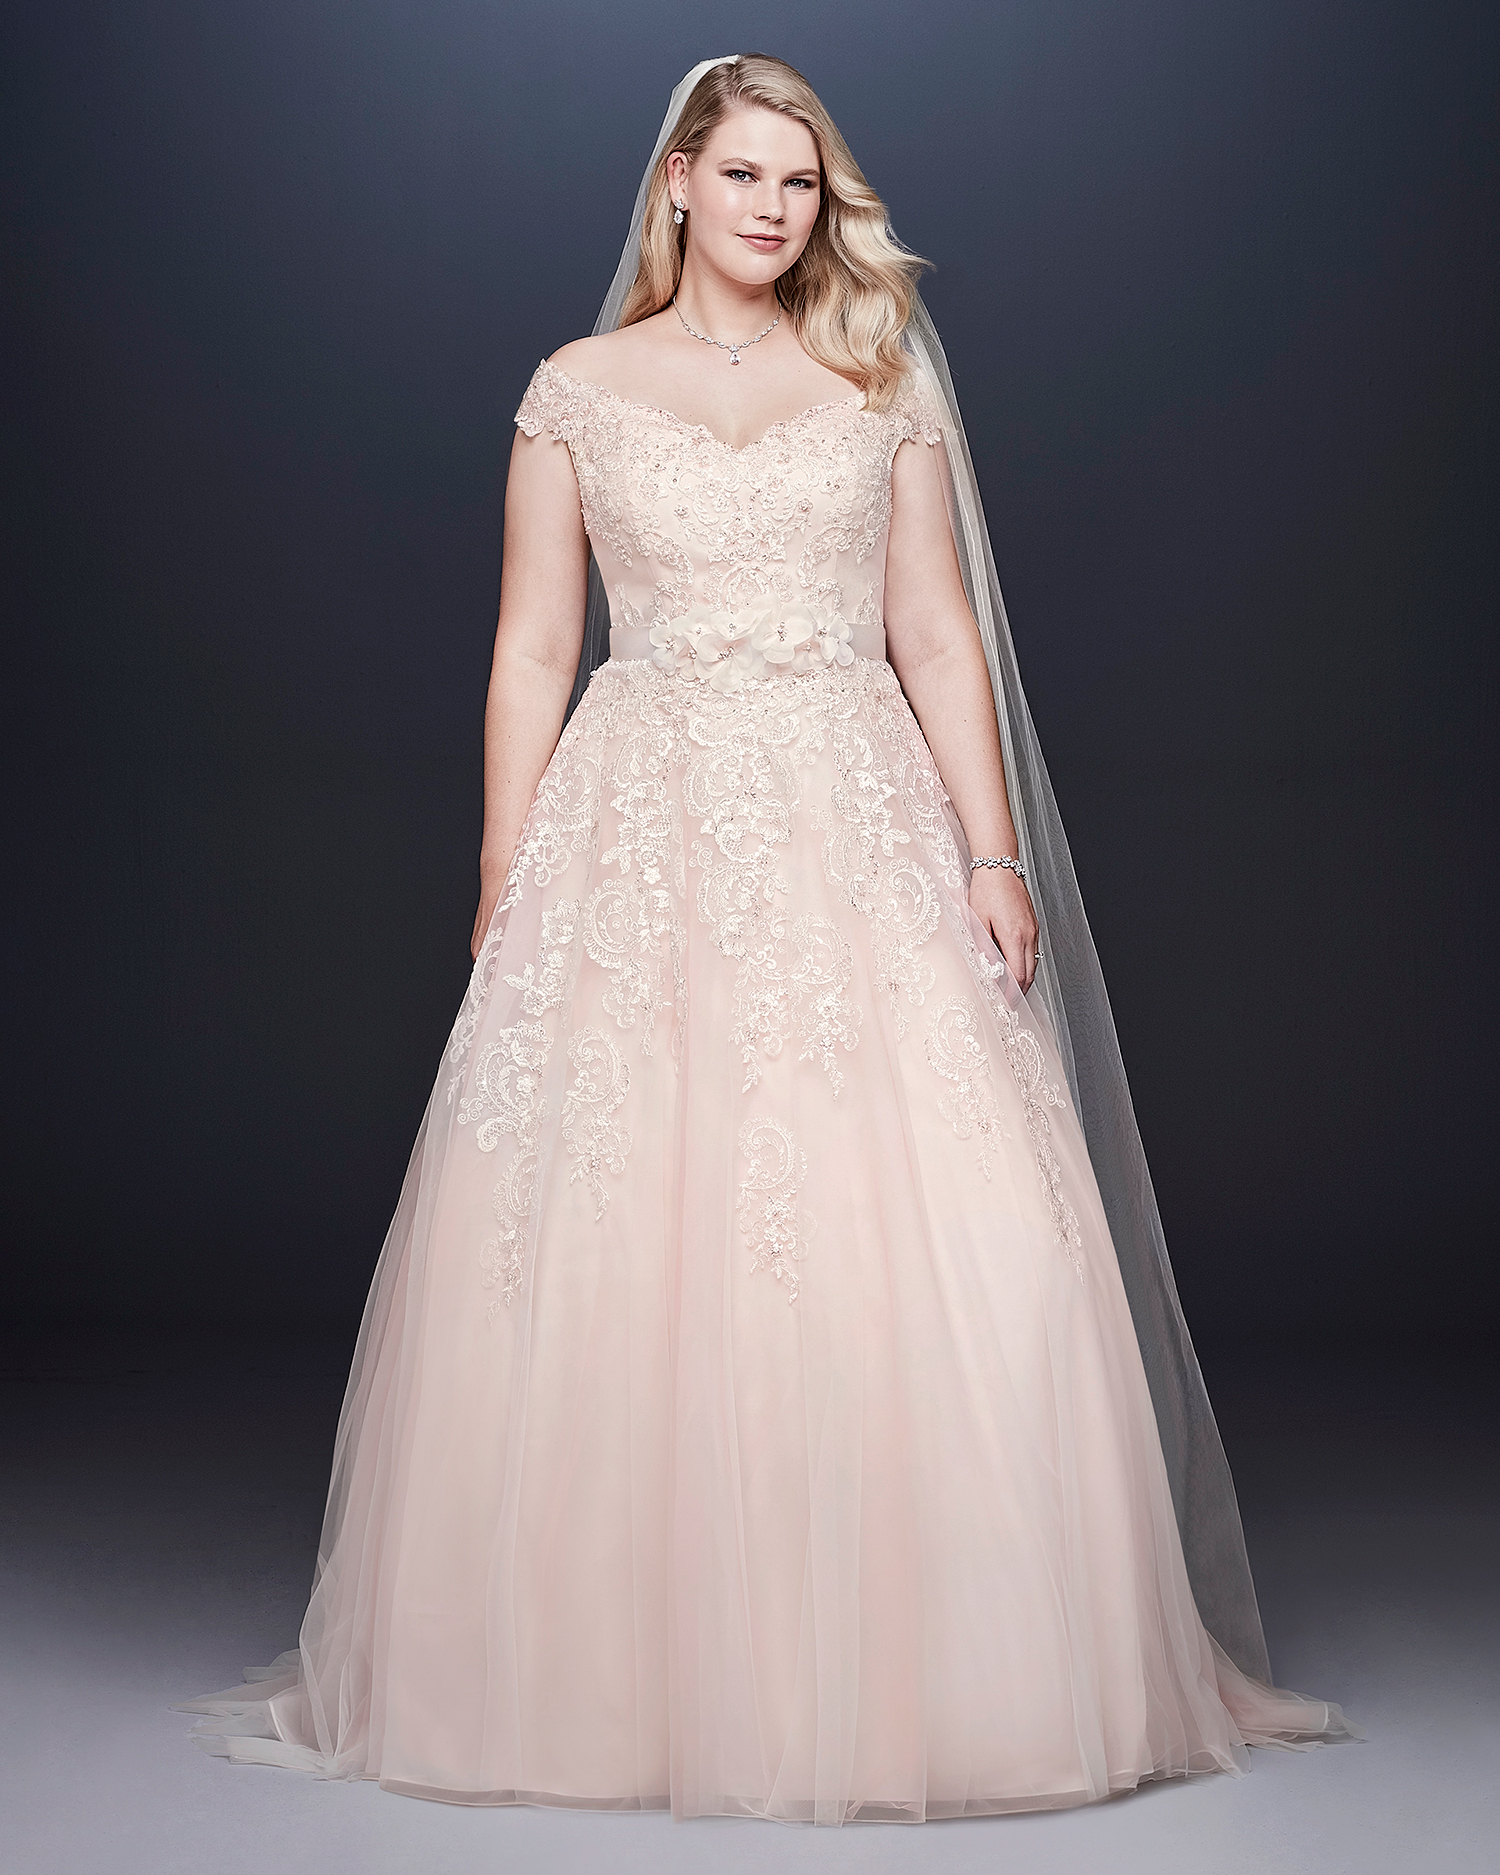 davids bridal wedding dress fall 2019 off-the-shoulder cap sleeves with belt